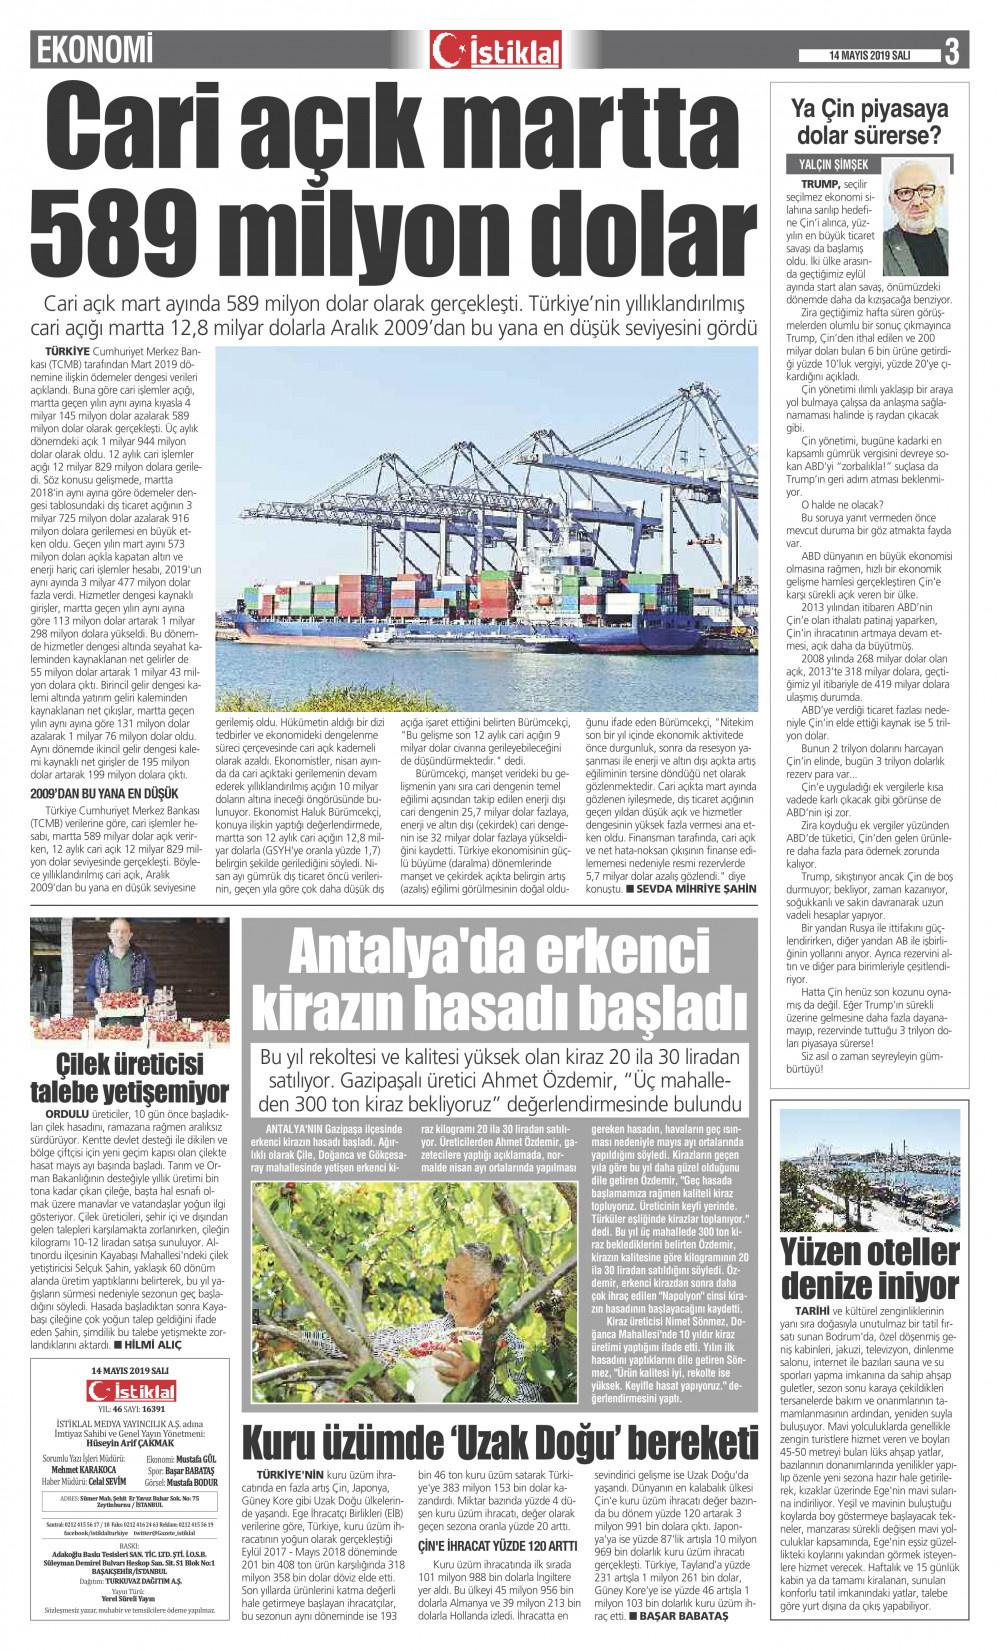 İstiklal Gazetesi 3'nci Sayfa